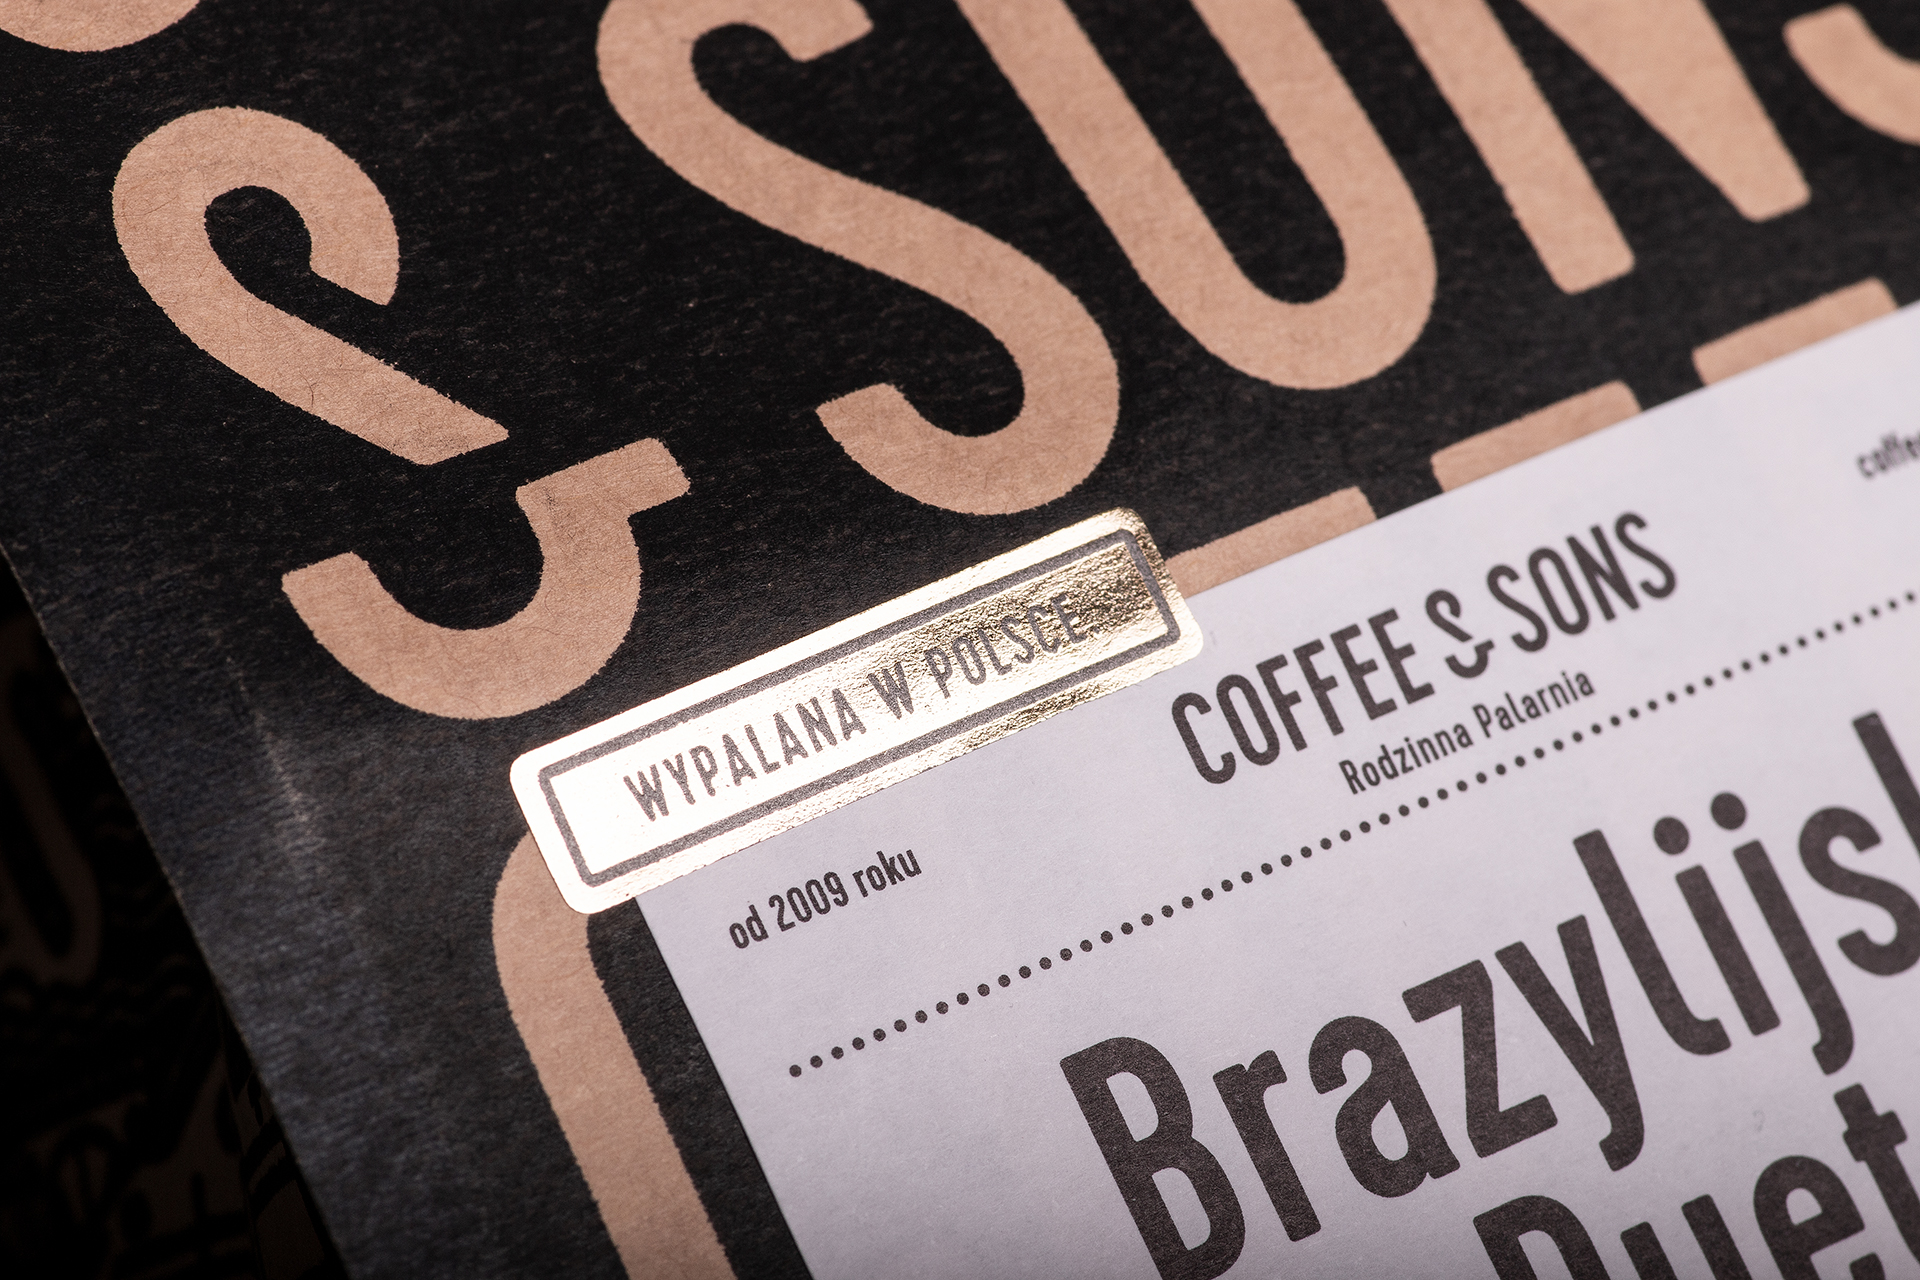 coffeeandsons_dmowskico_08.jpg